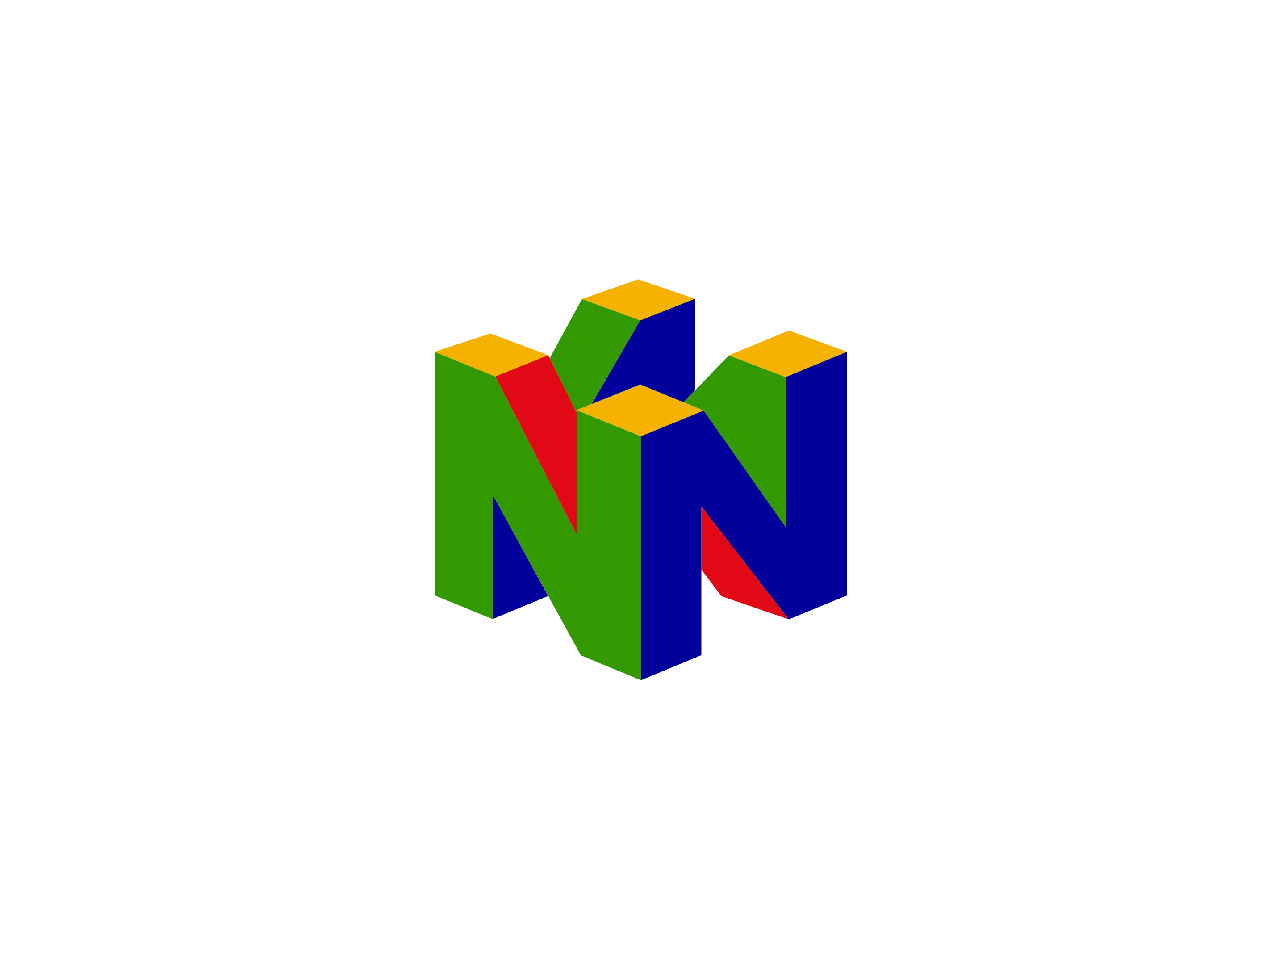 Nintendo 64 Logo 41559 1280x960 Px HDWallSource